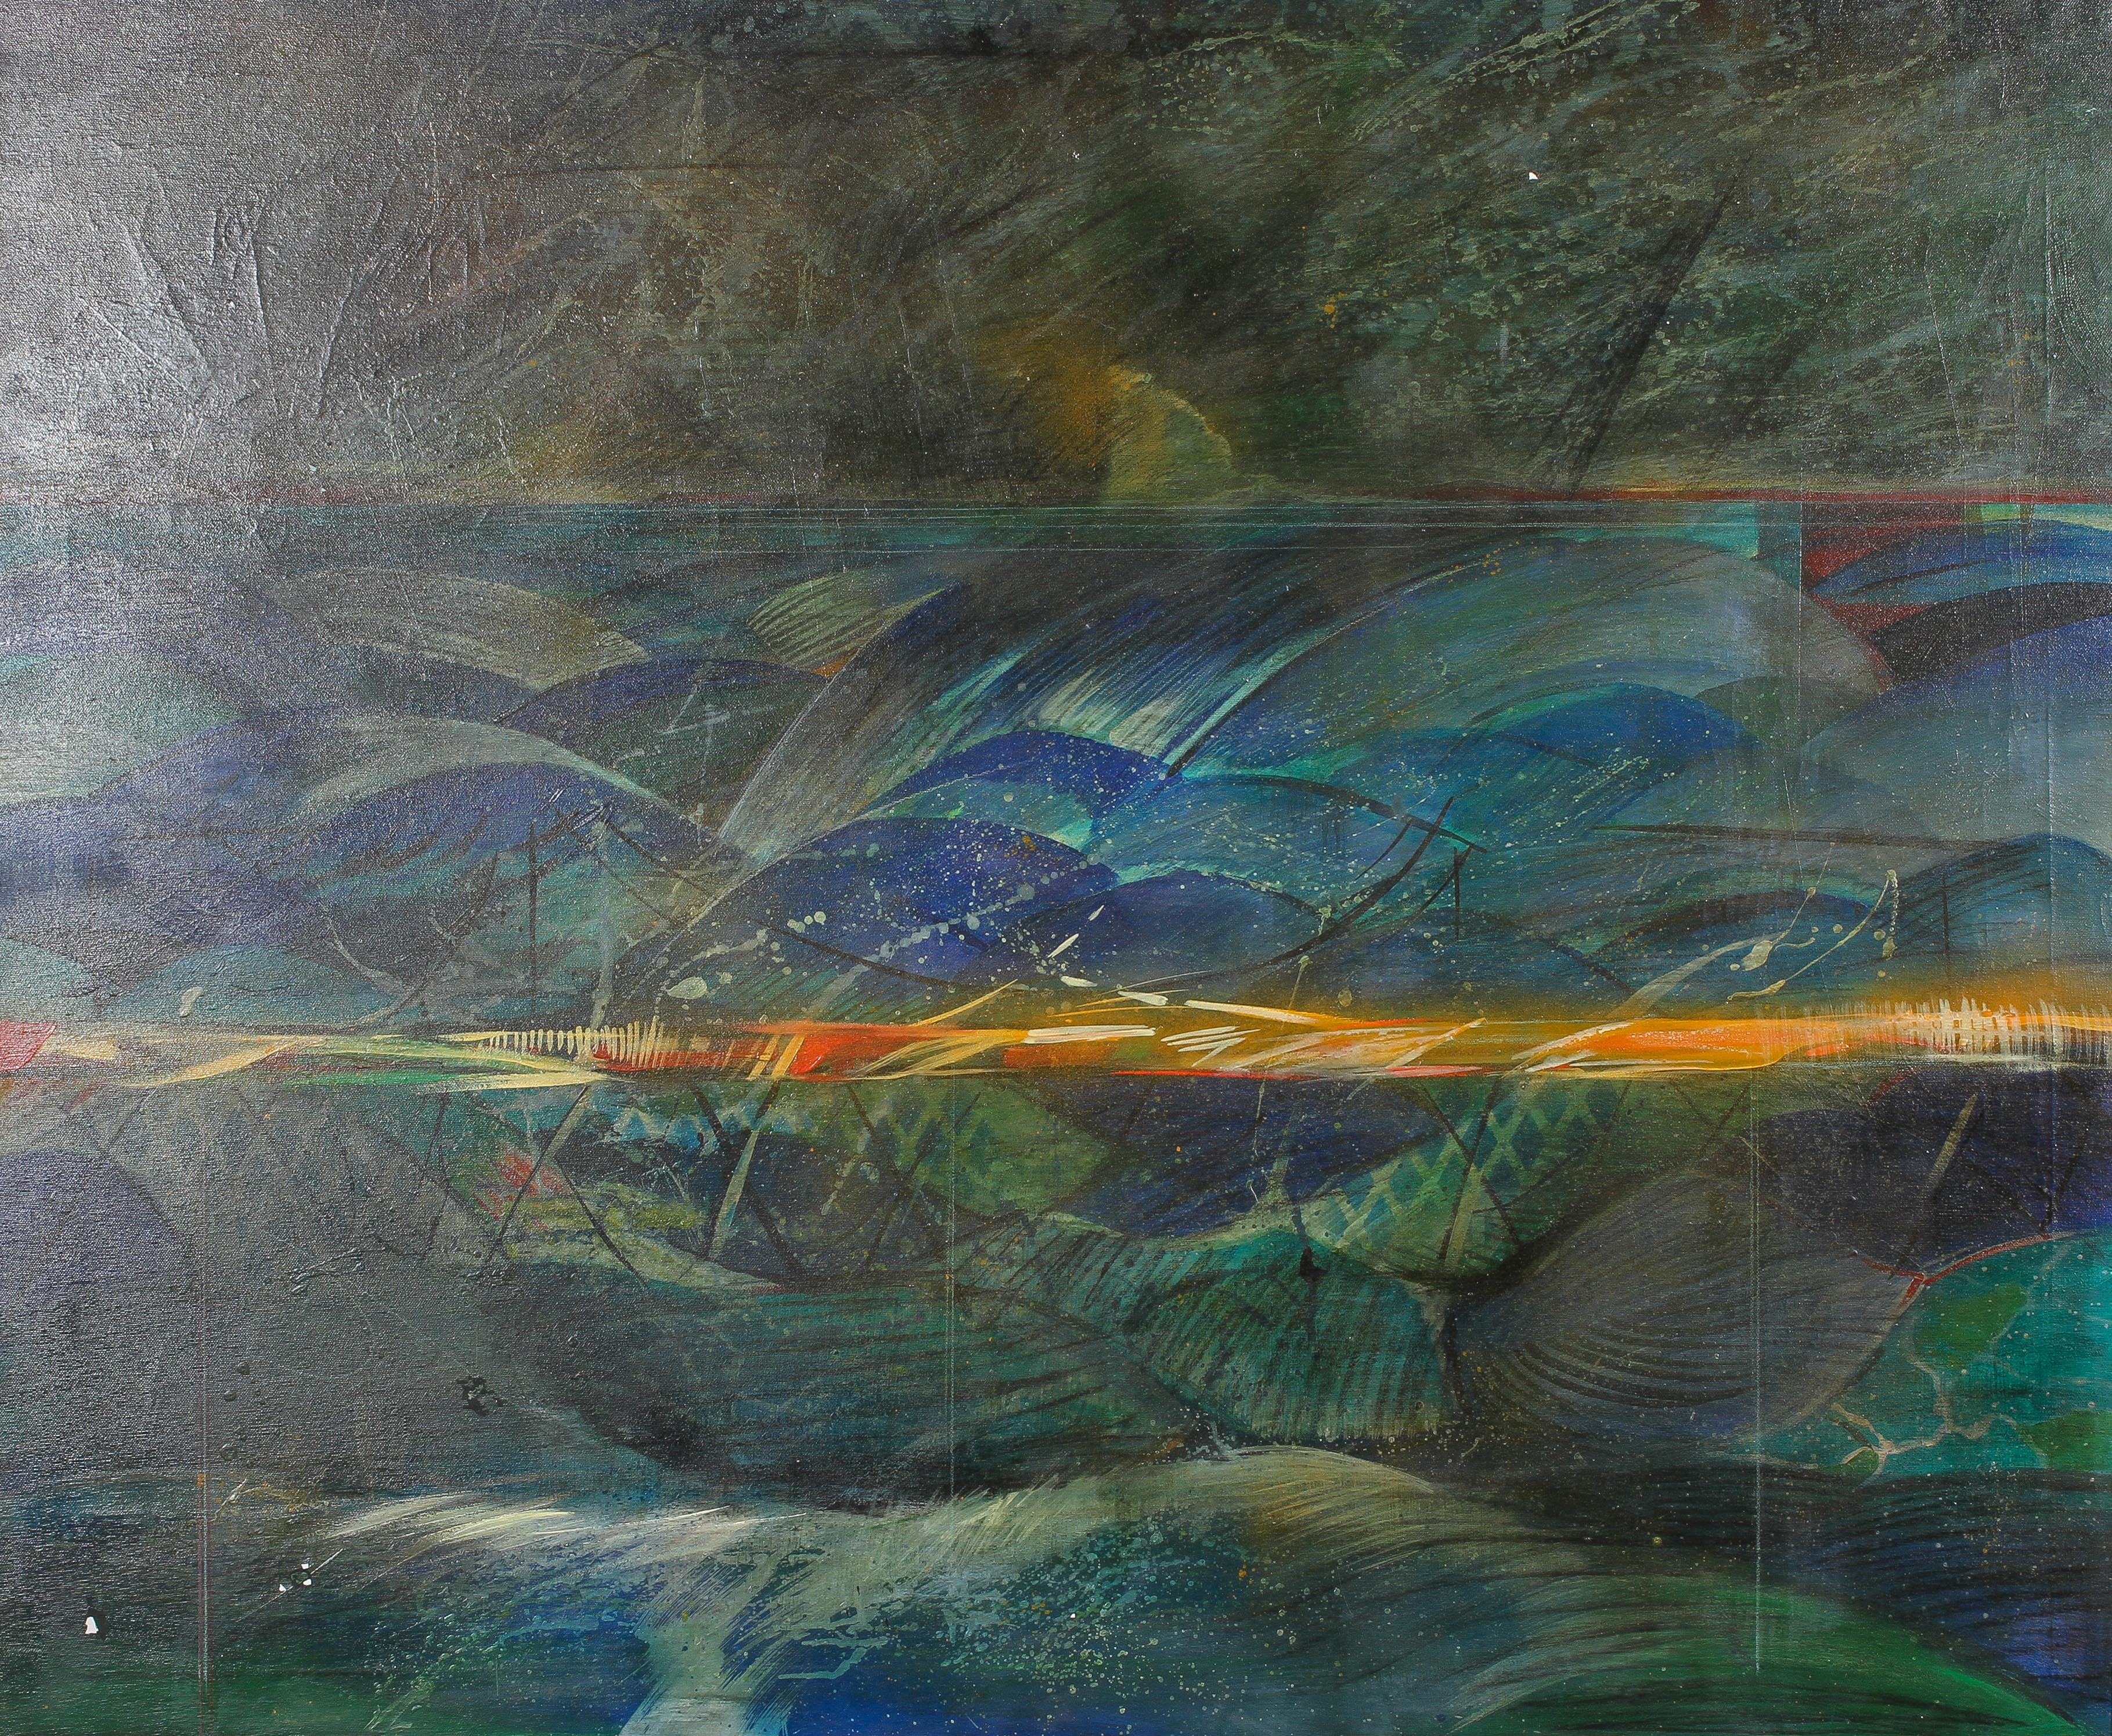 Carmine Errichiello, Grieve in Chianti, an abstract landscape, oil on canvas,